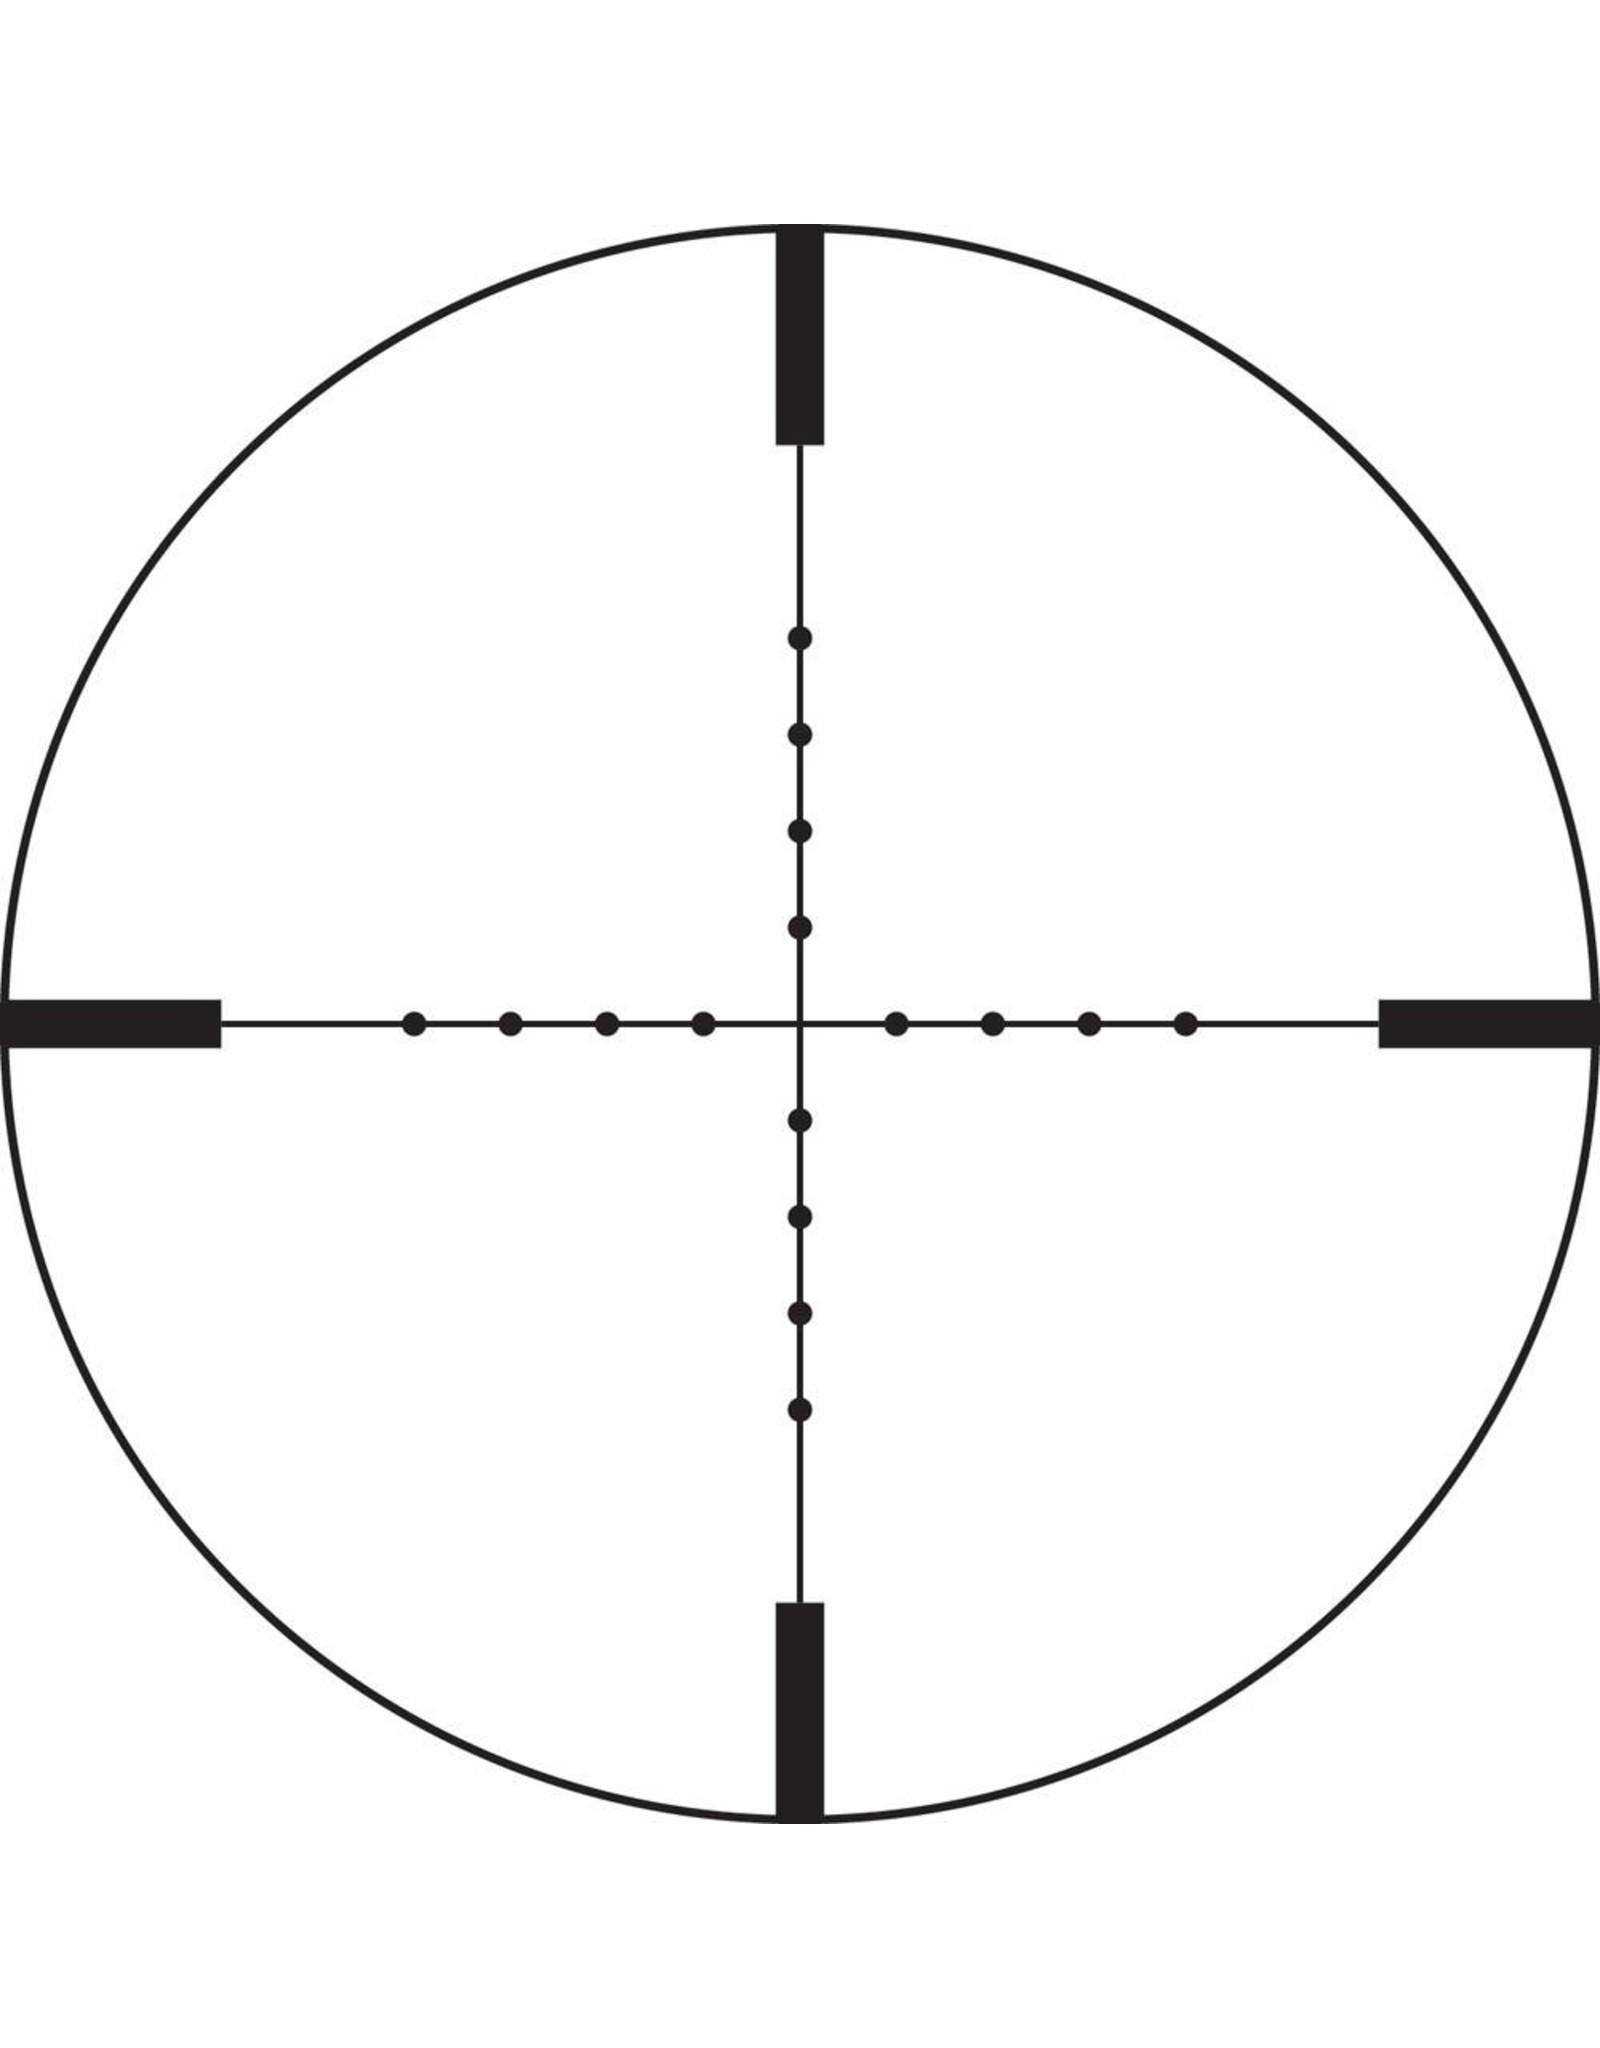 Vortex Vortex Viper 6.5-20x50 PA Riflescope Mil-Dot